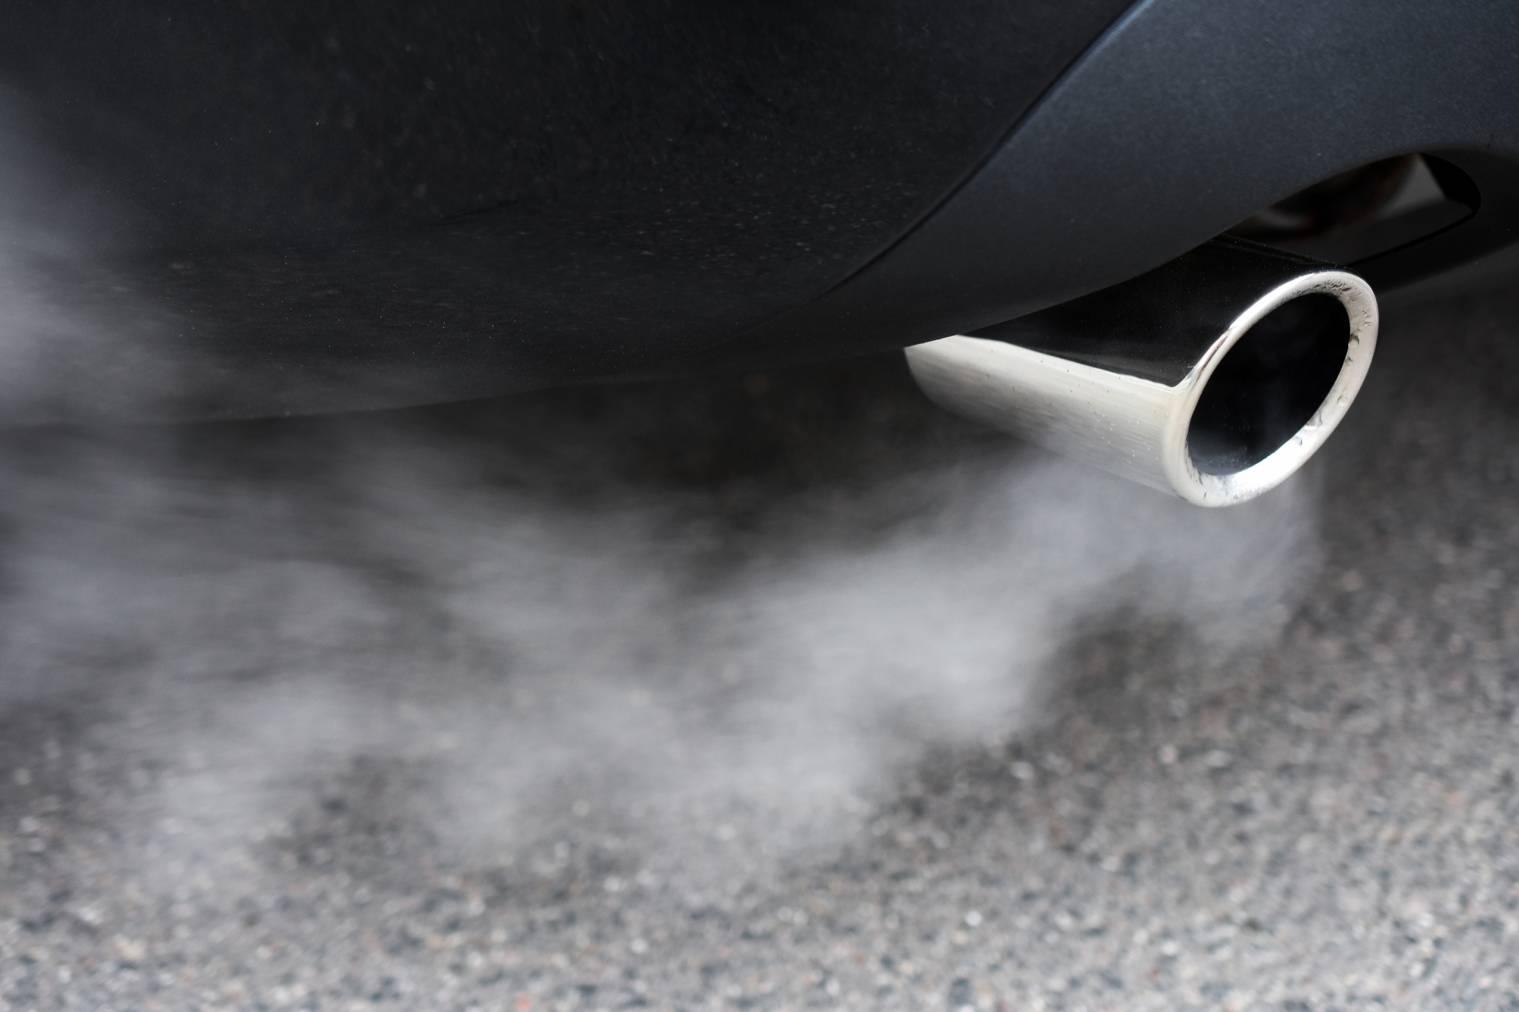 voiture pollution environnement vignette